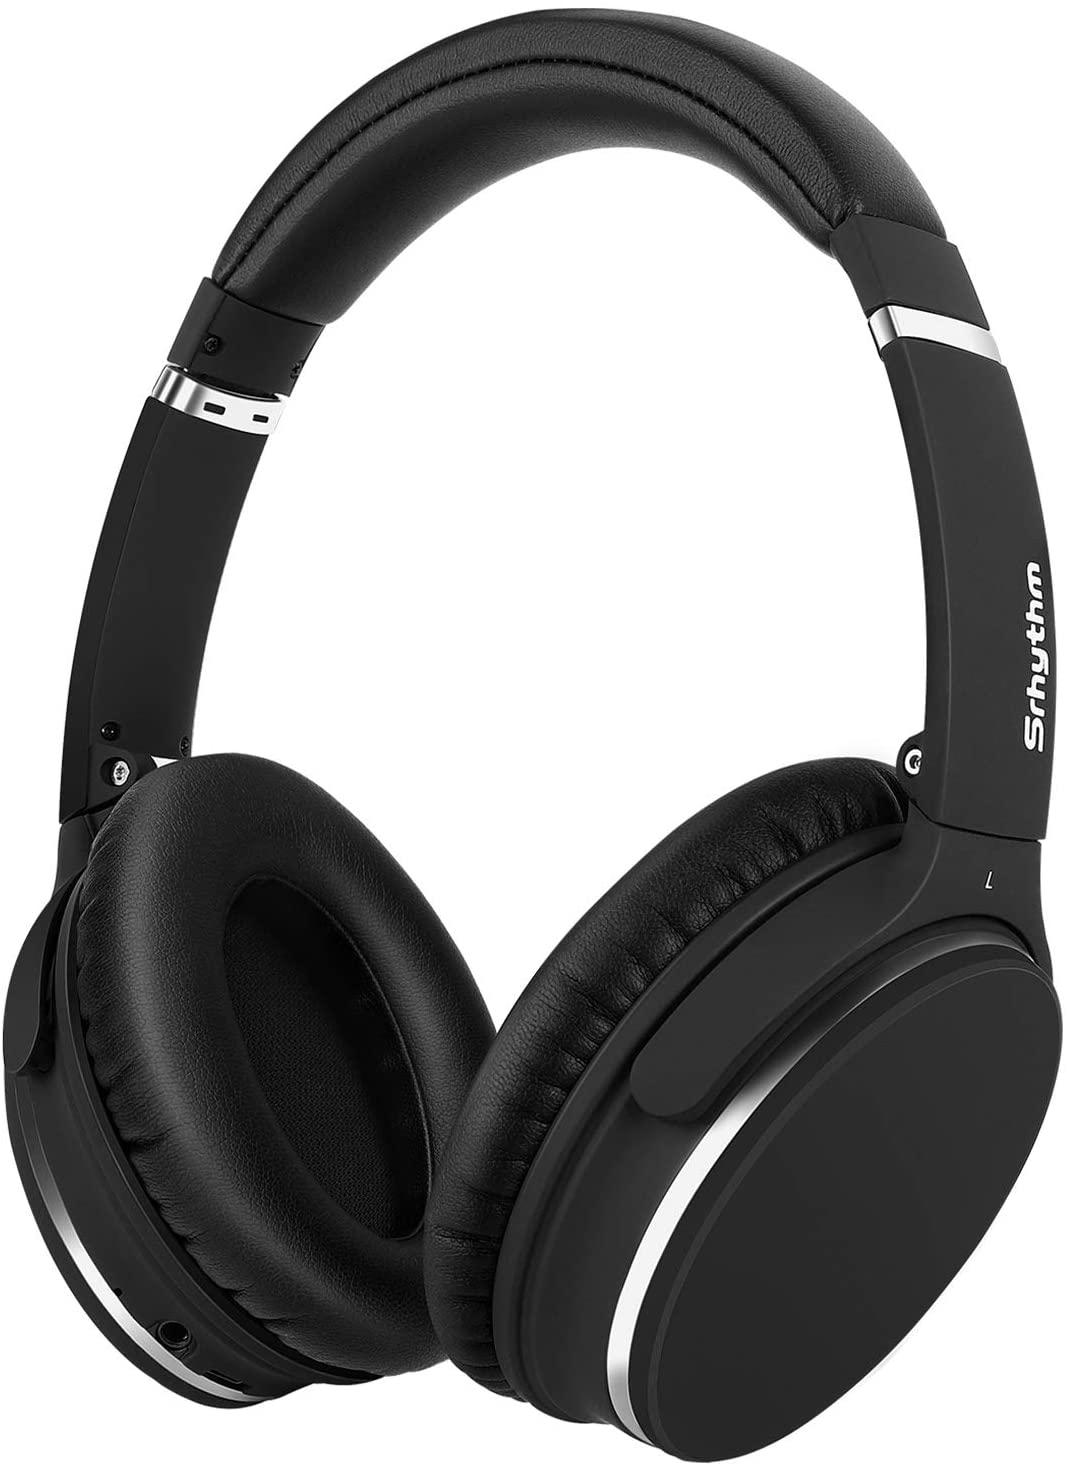 Unser Tipp: Kabellose Noise-Cancelling-Kopfhörer